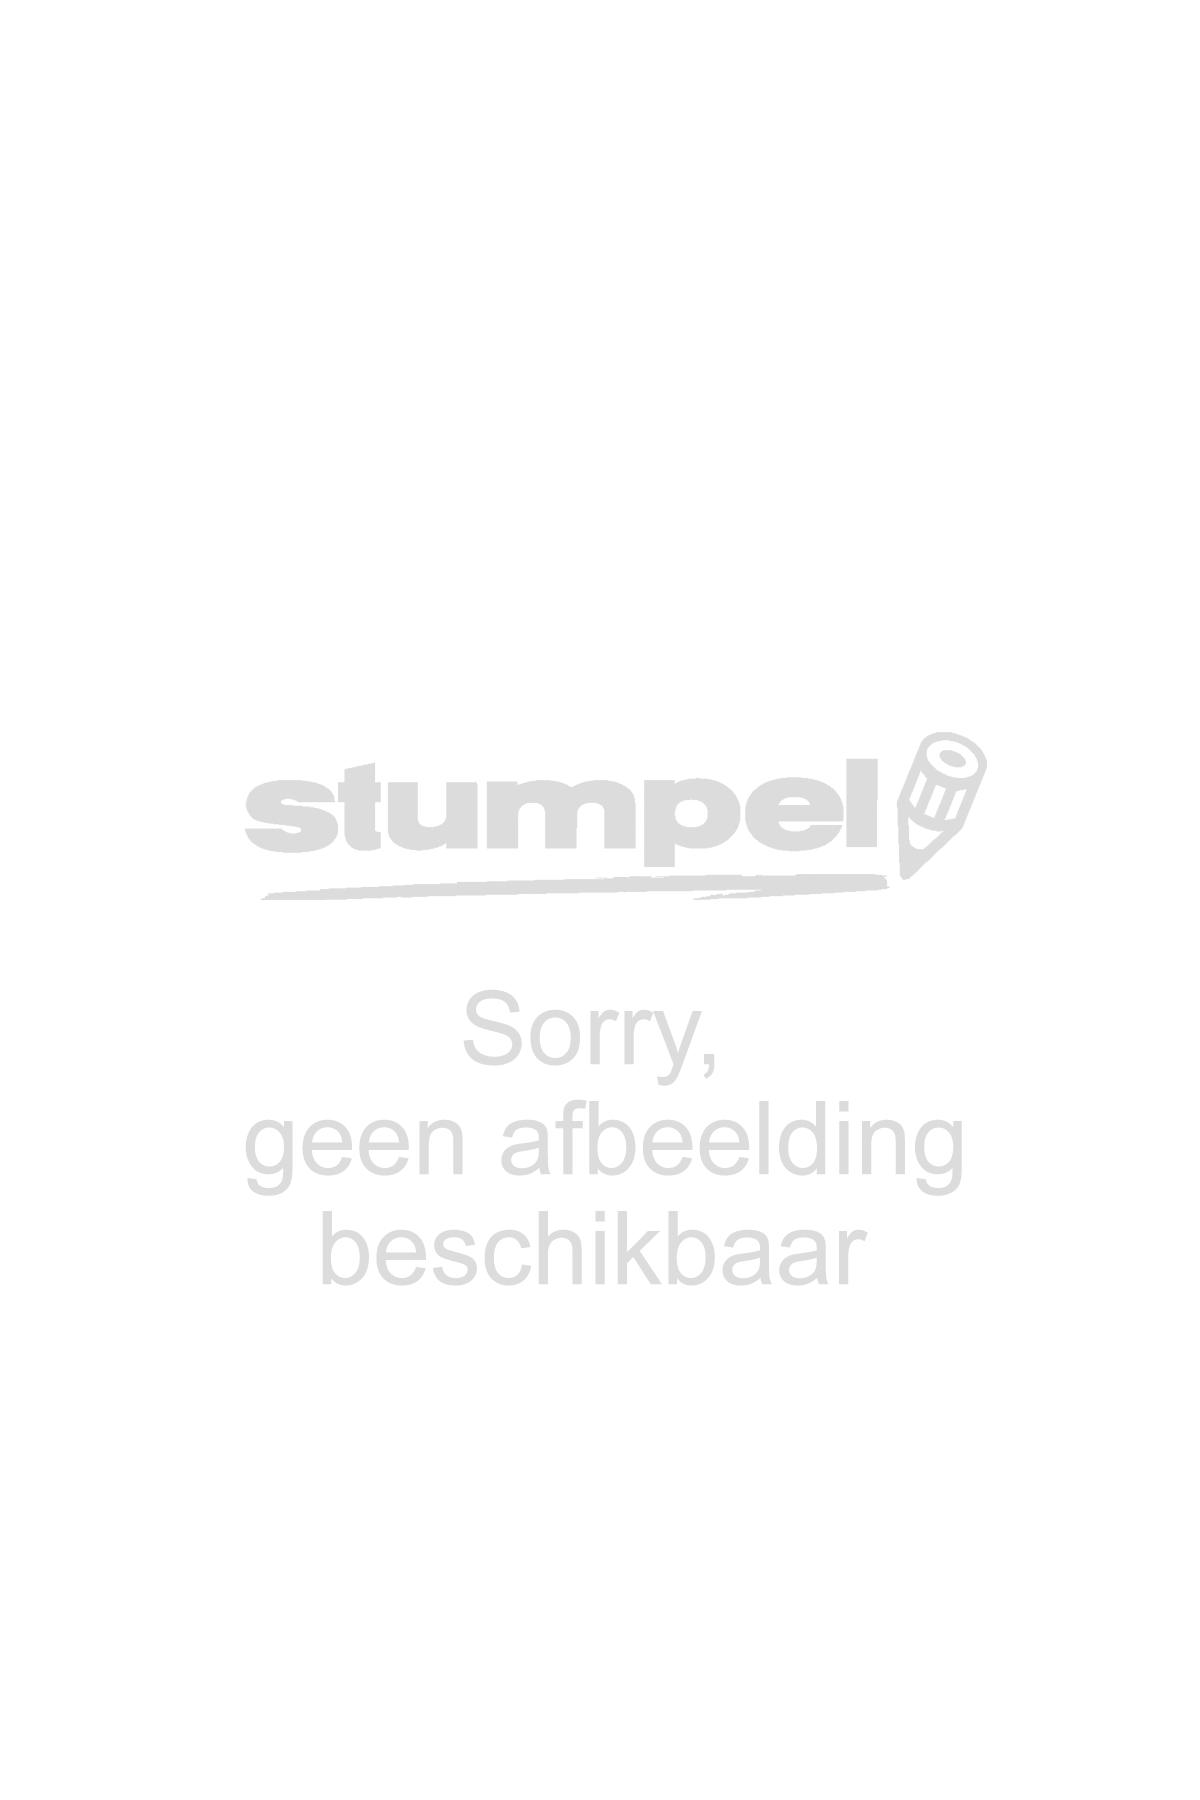 Software Sigel Businesscard Meertalig